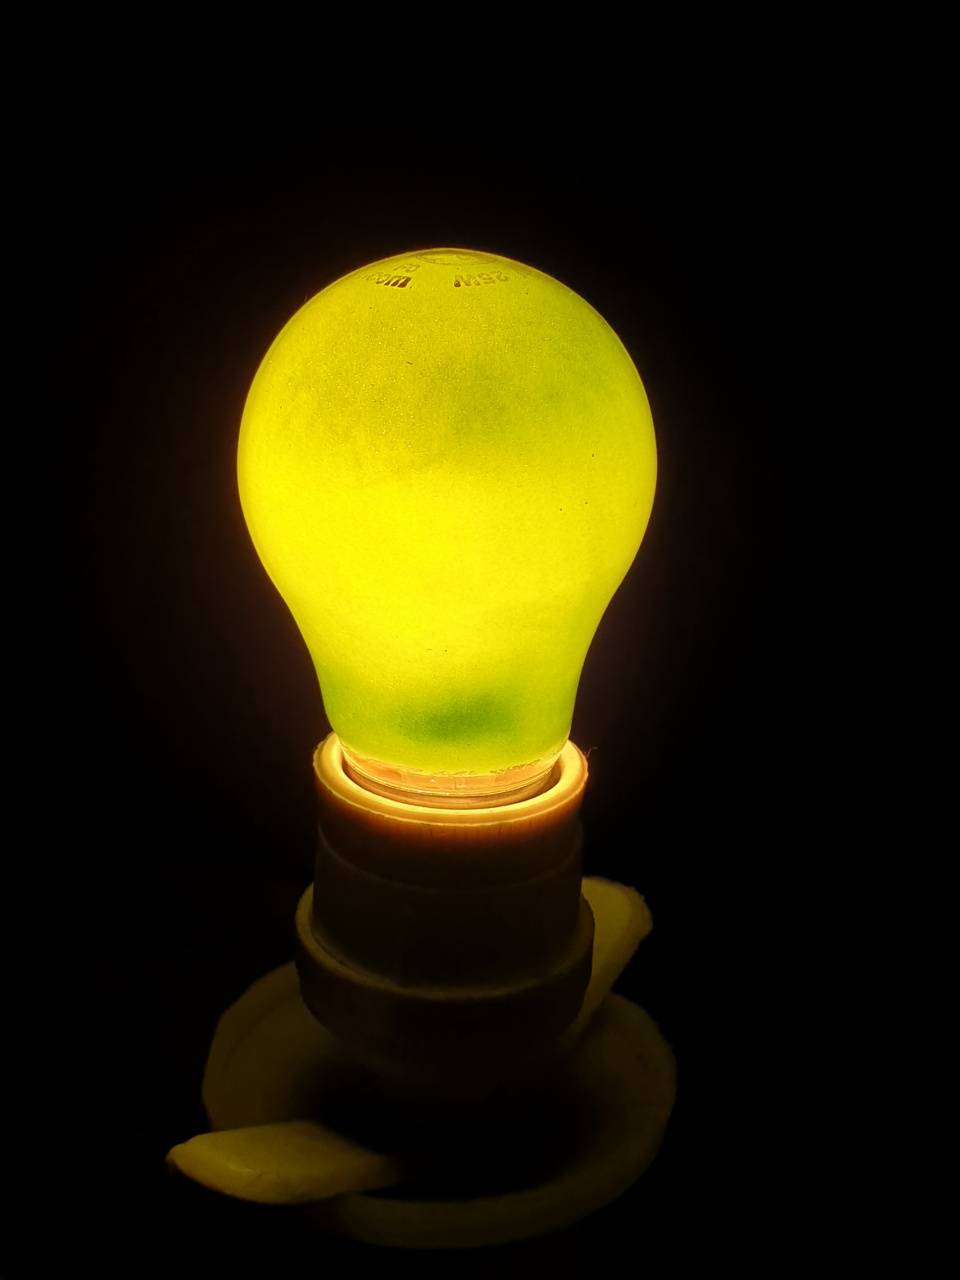 lightbulb greenish